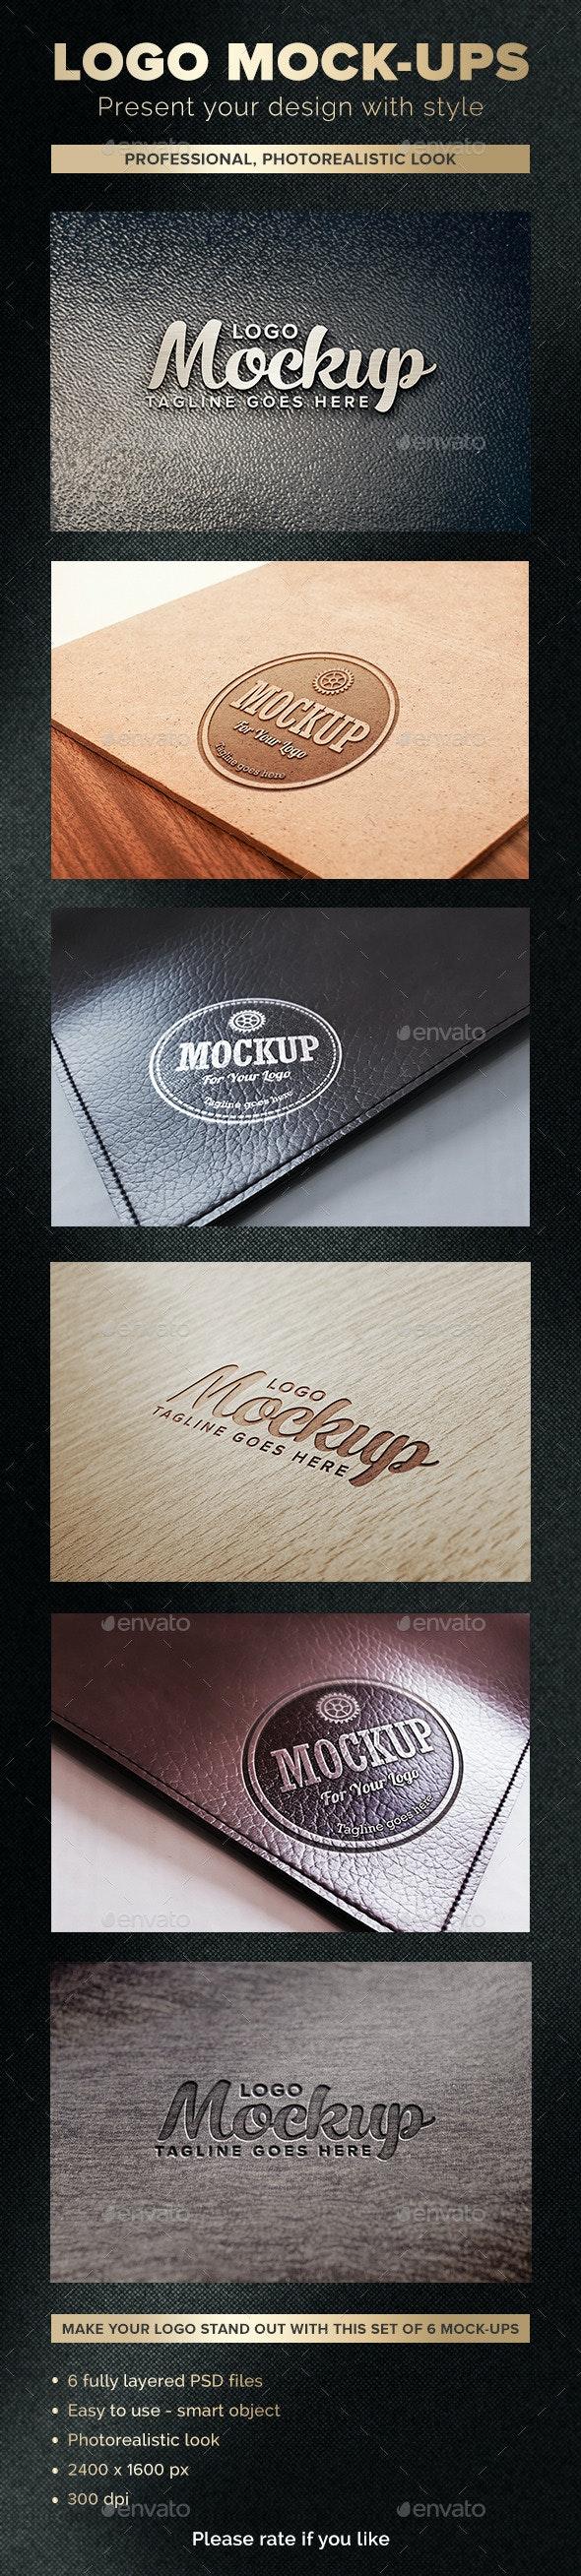 Logo Mockups - Logo Product Mock-Ups